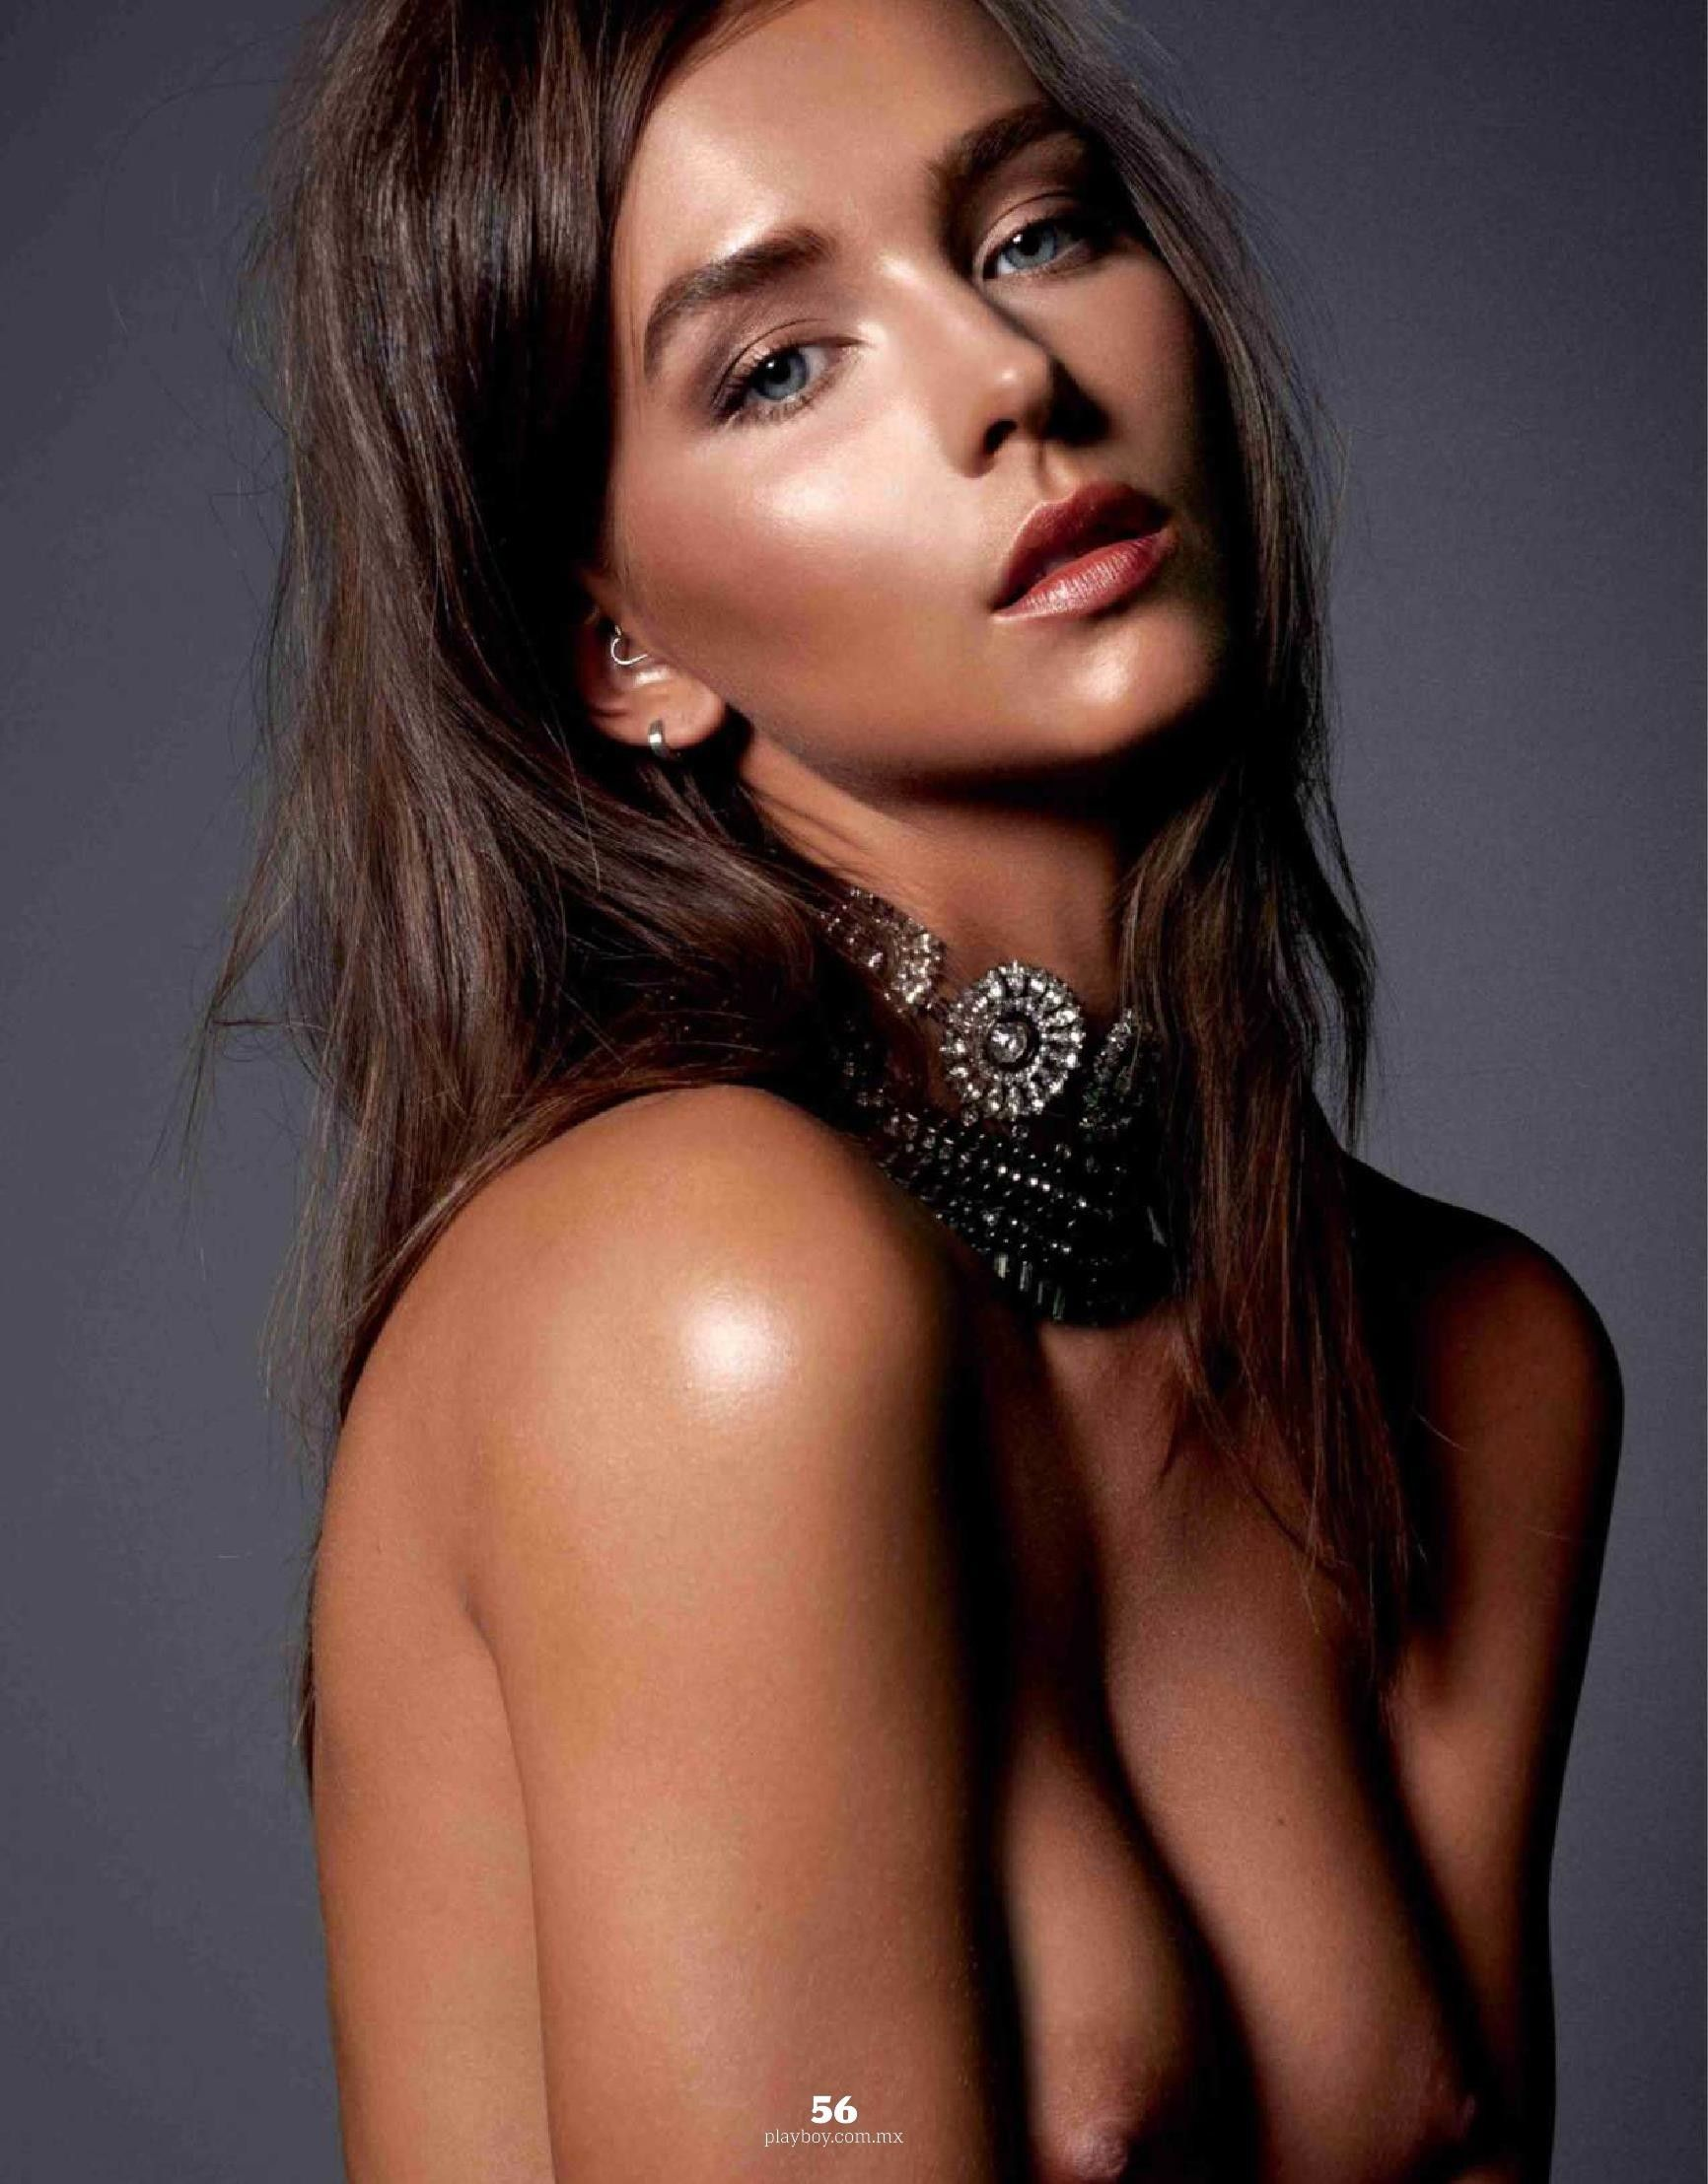 Nude pics of Rachel Cook. 2018-2019 celebrityes photos leaks! - 2019 year